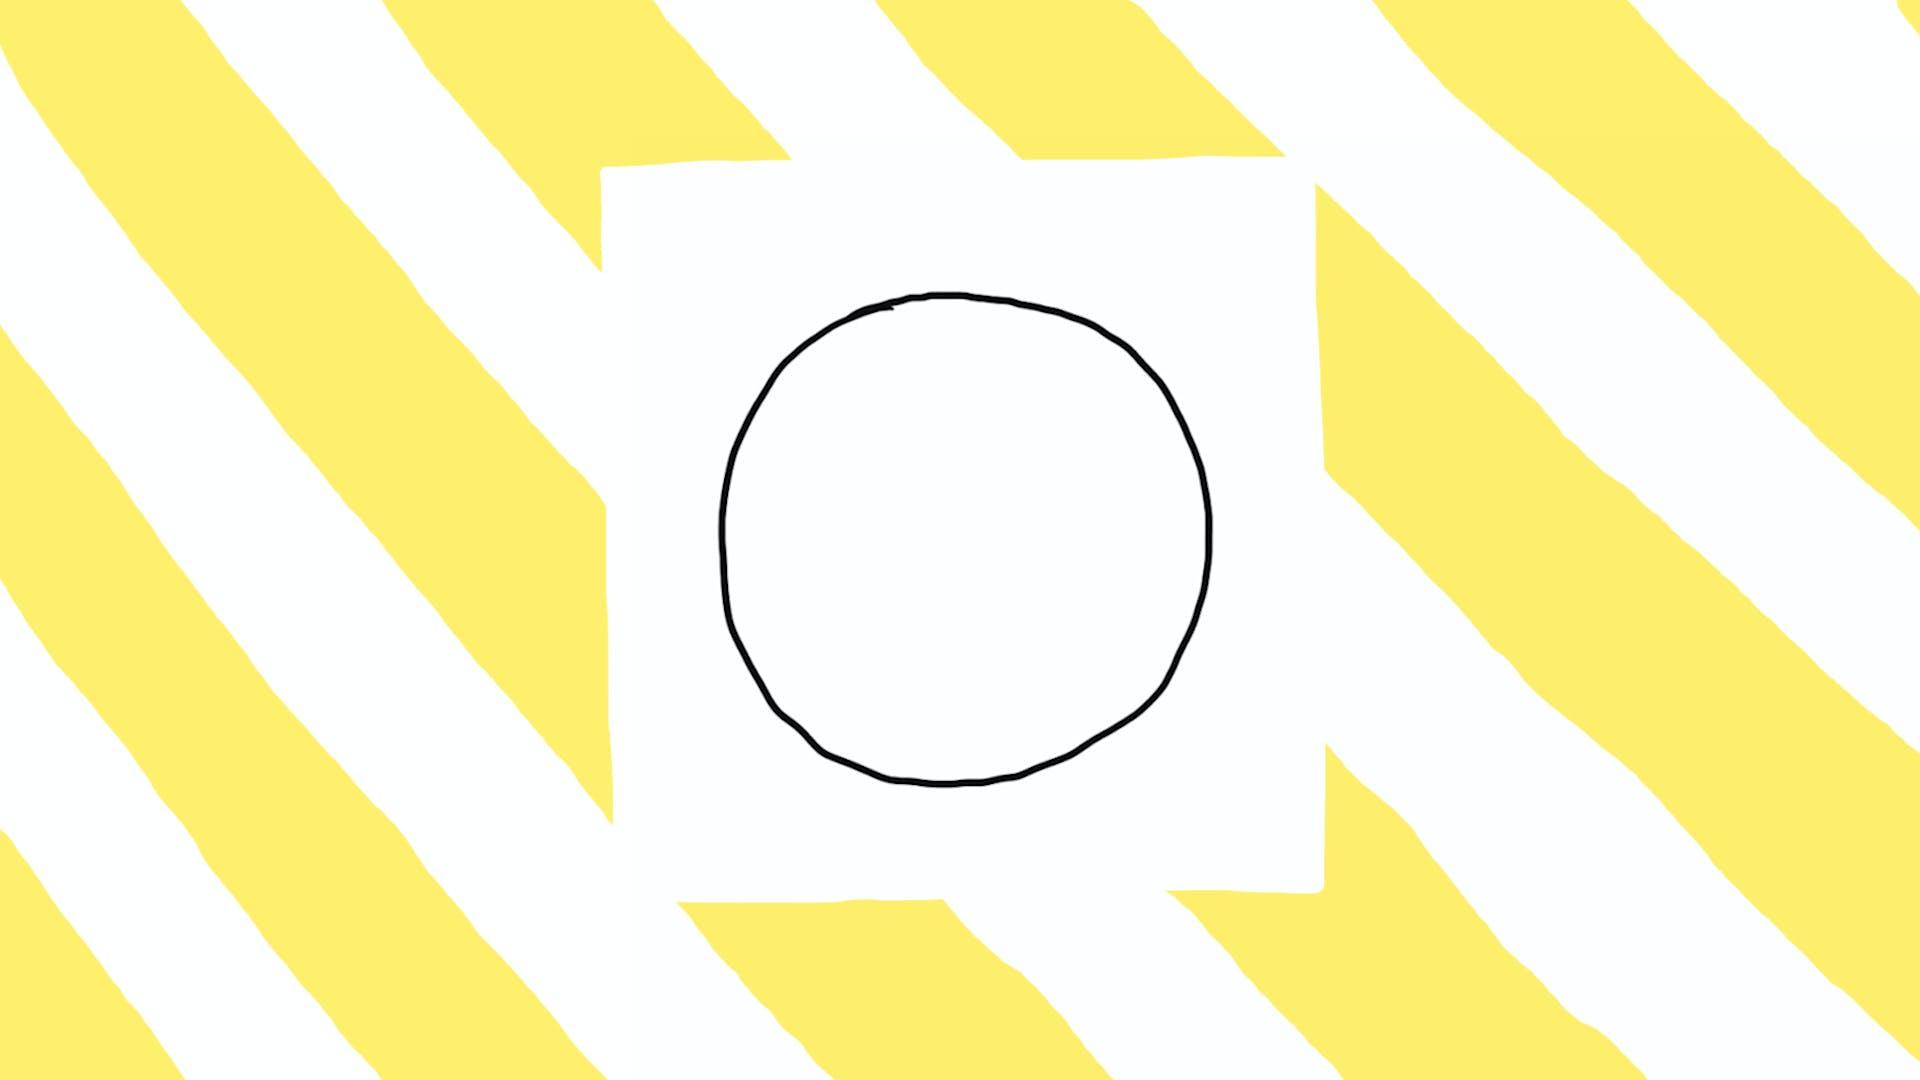 Start with a big circle